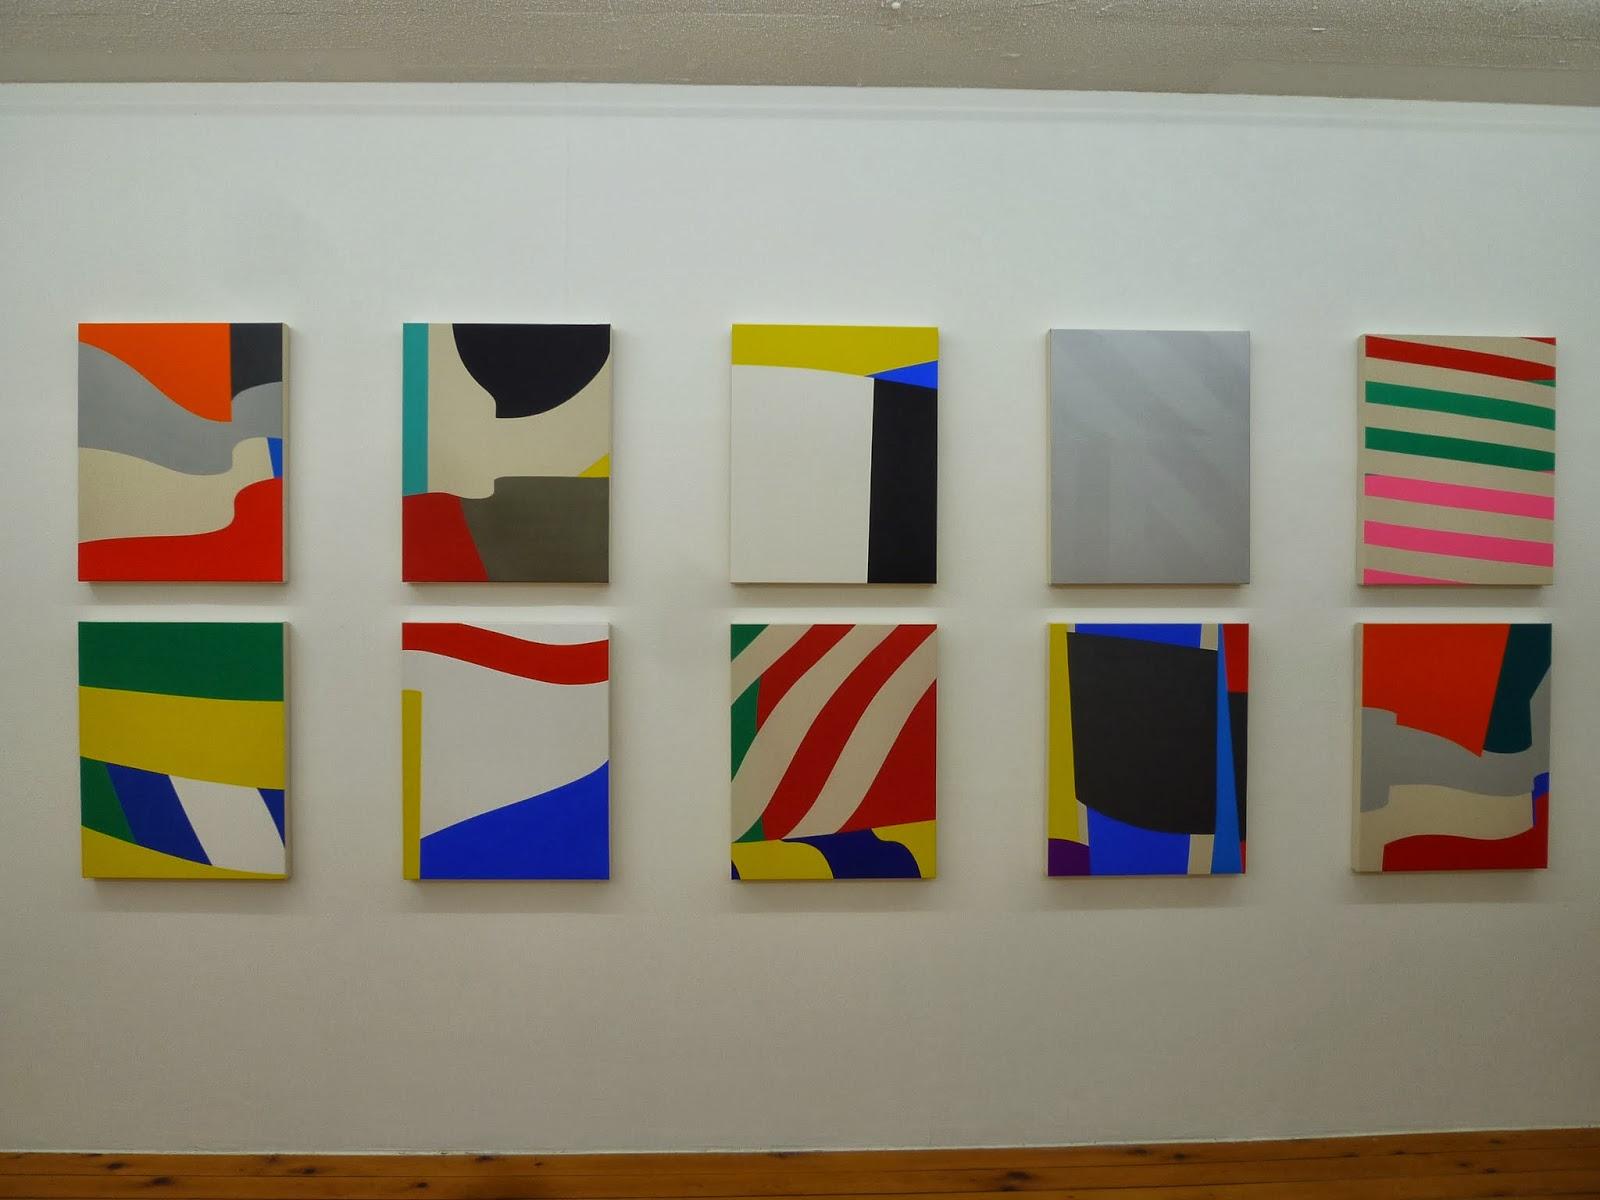 Line Color Form : Report color form exhibihiton by shunsuke imai japanese